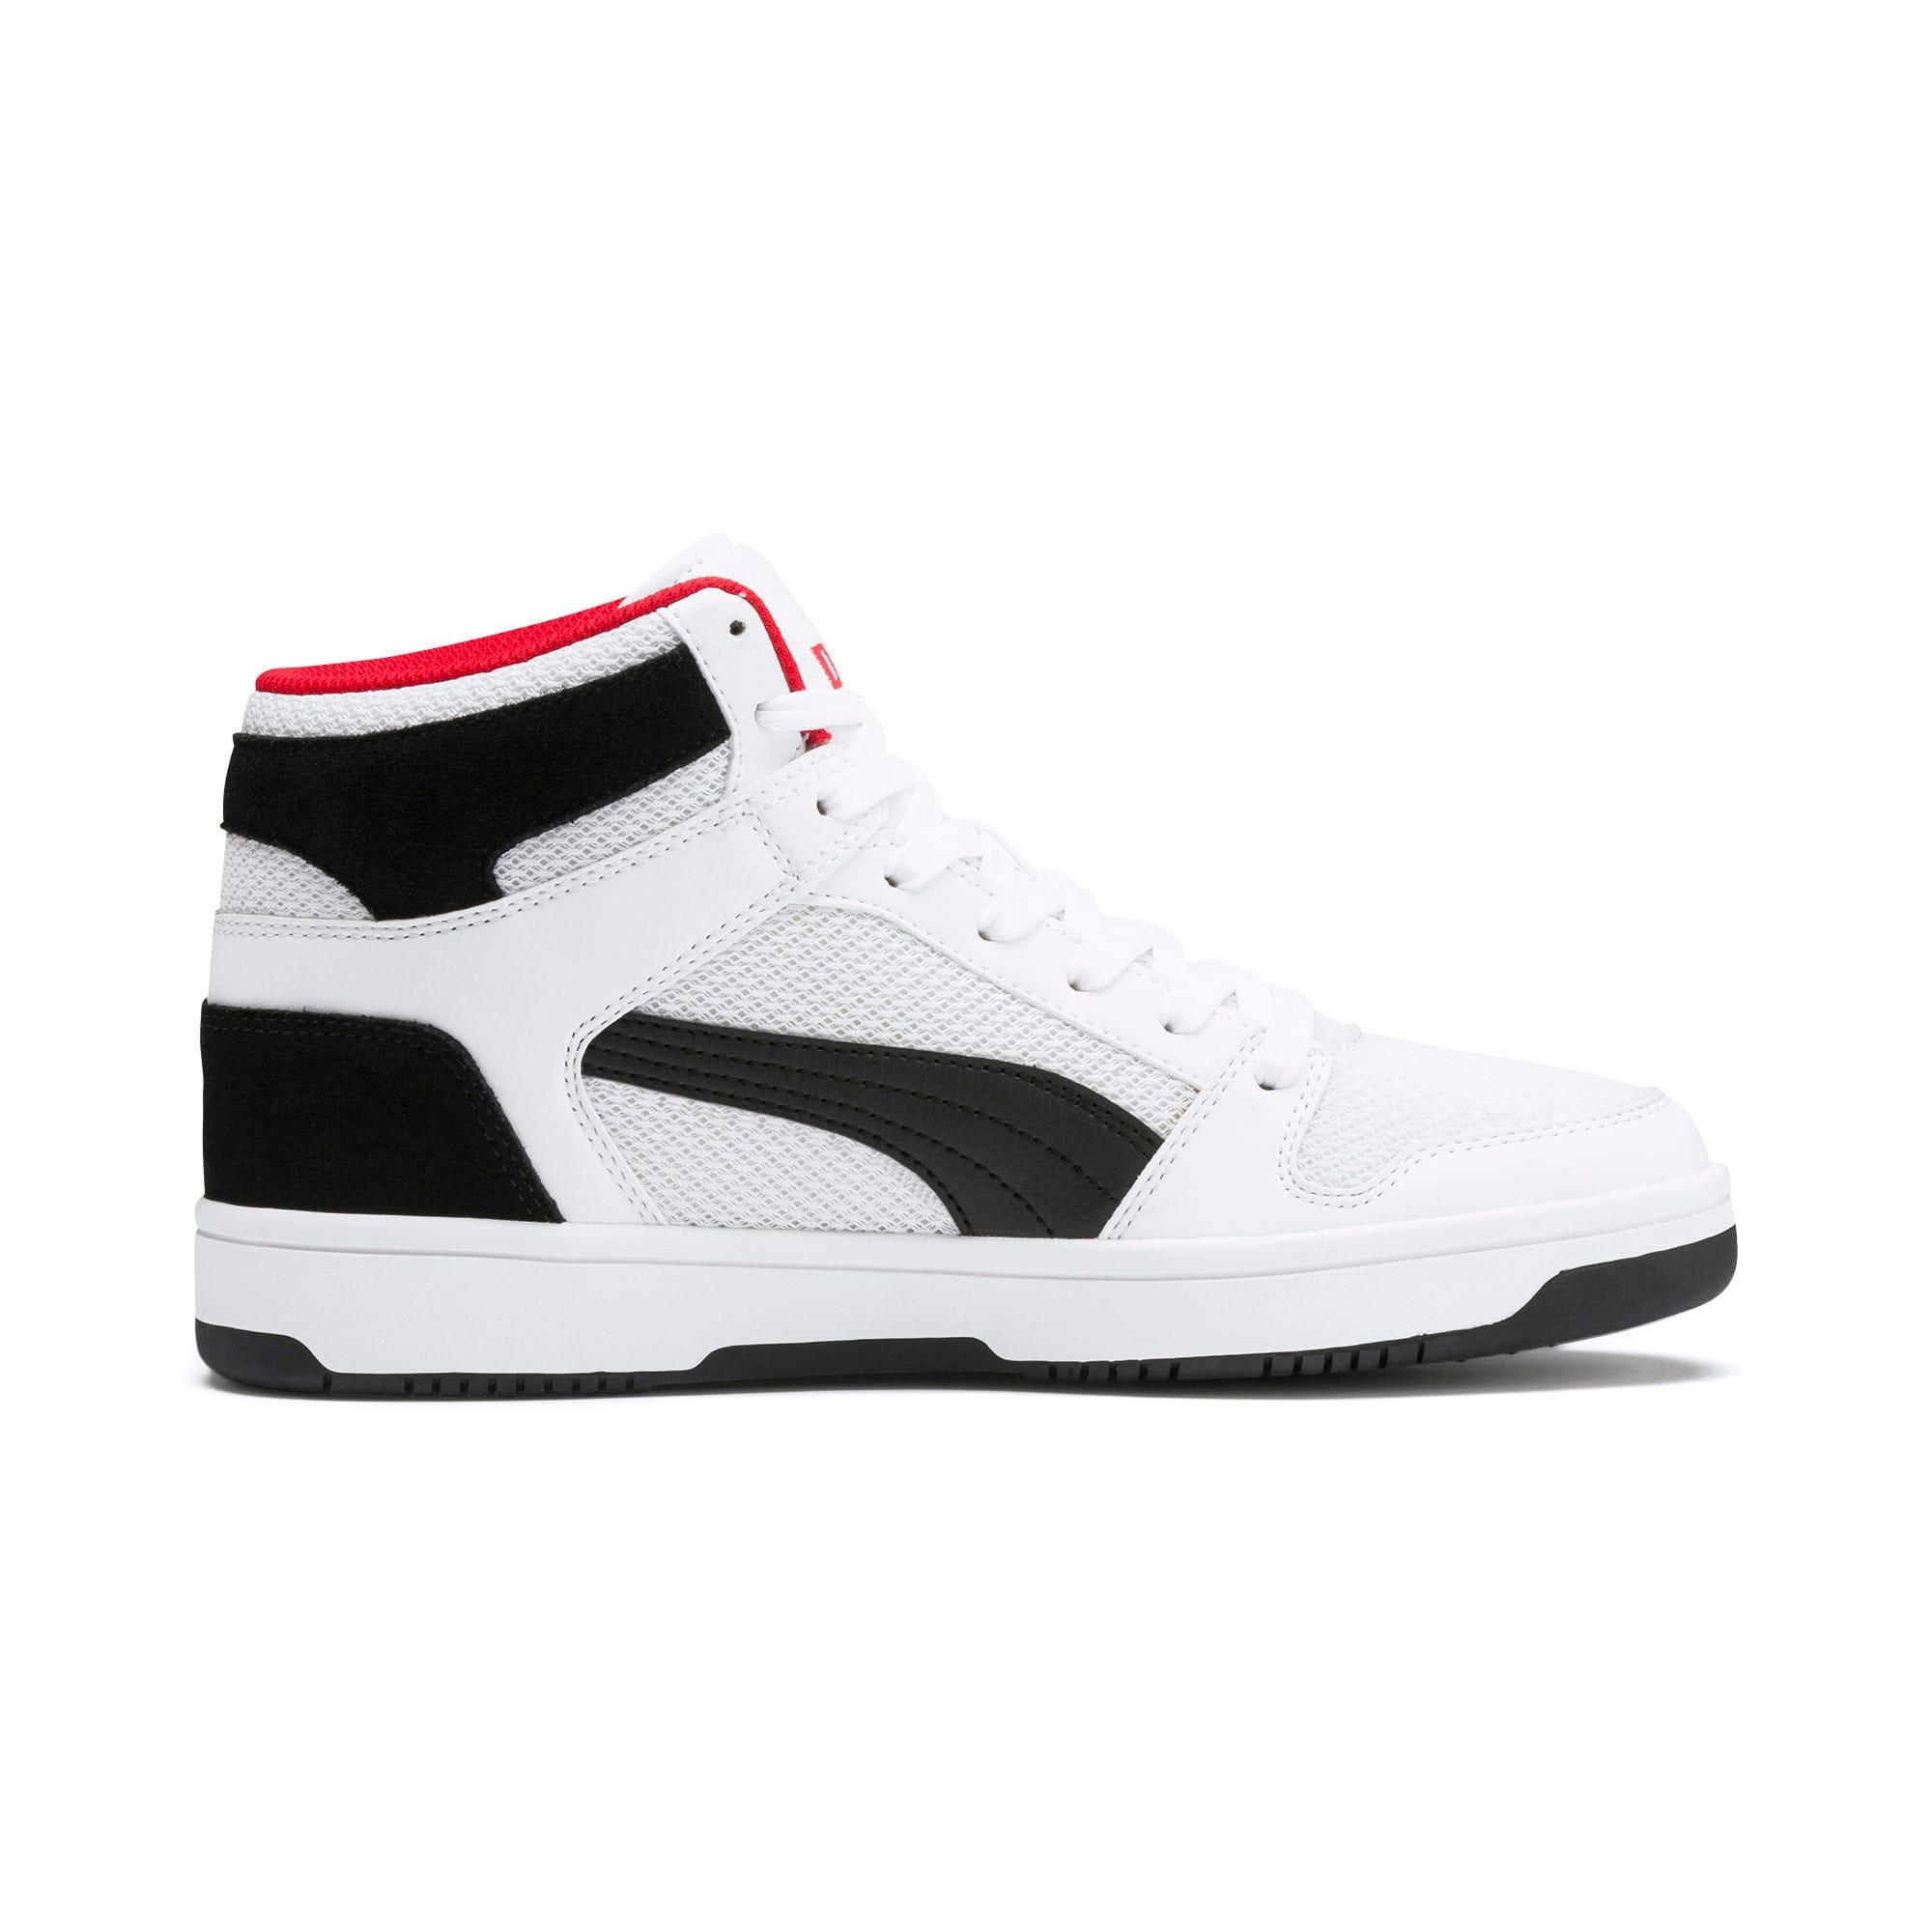 Thumbnail 5 of PUMA Rebound LayUp Mesh Sneakers, White-Black-High Risk Red, medium